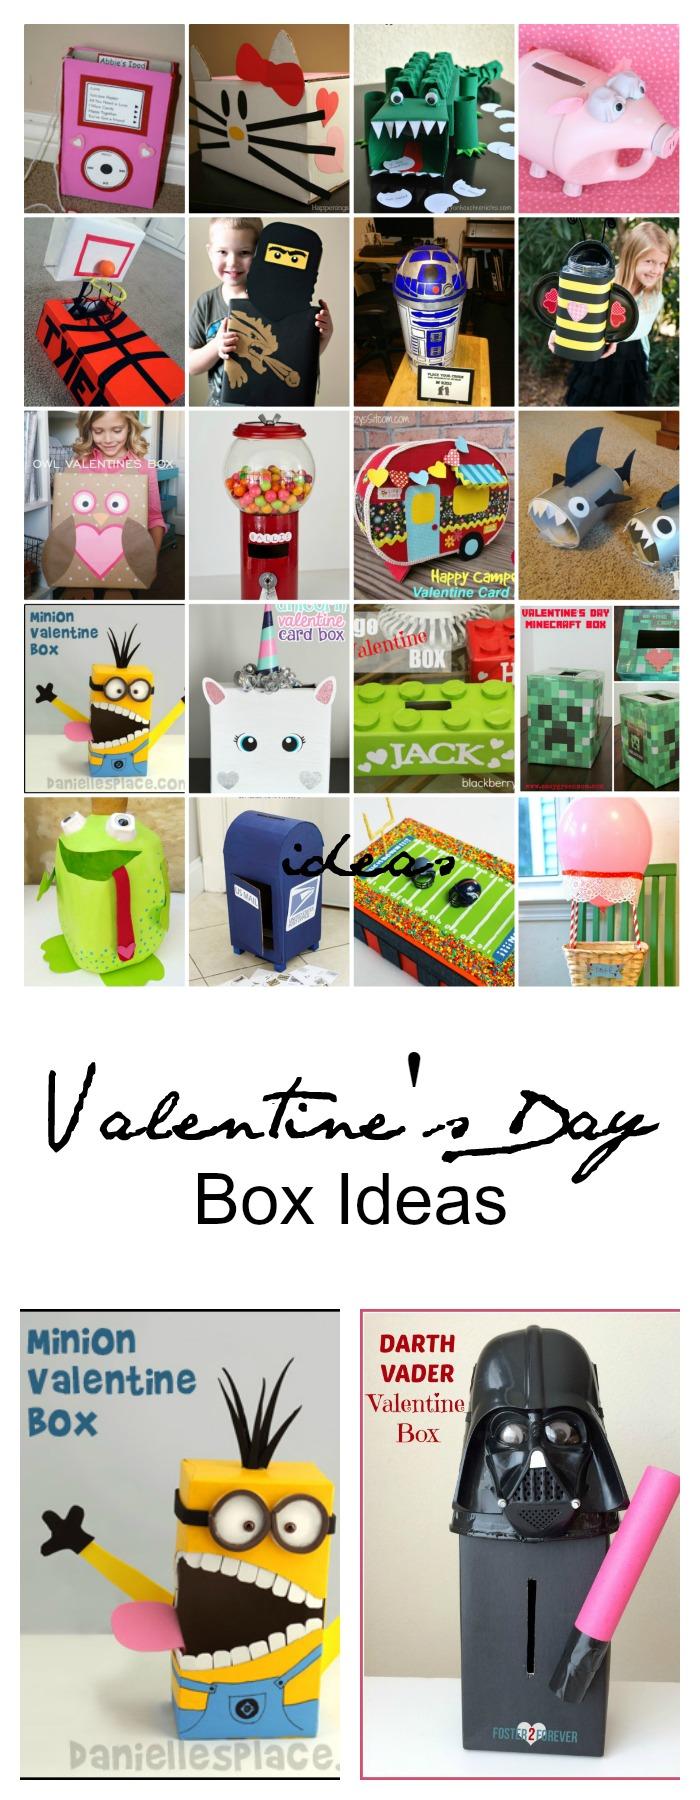 Valentines-Day-Box-Ideas-1